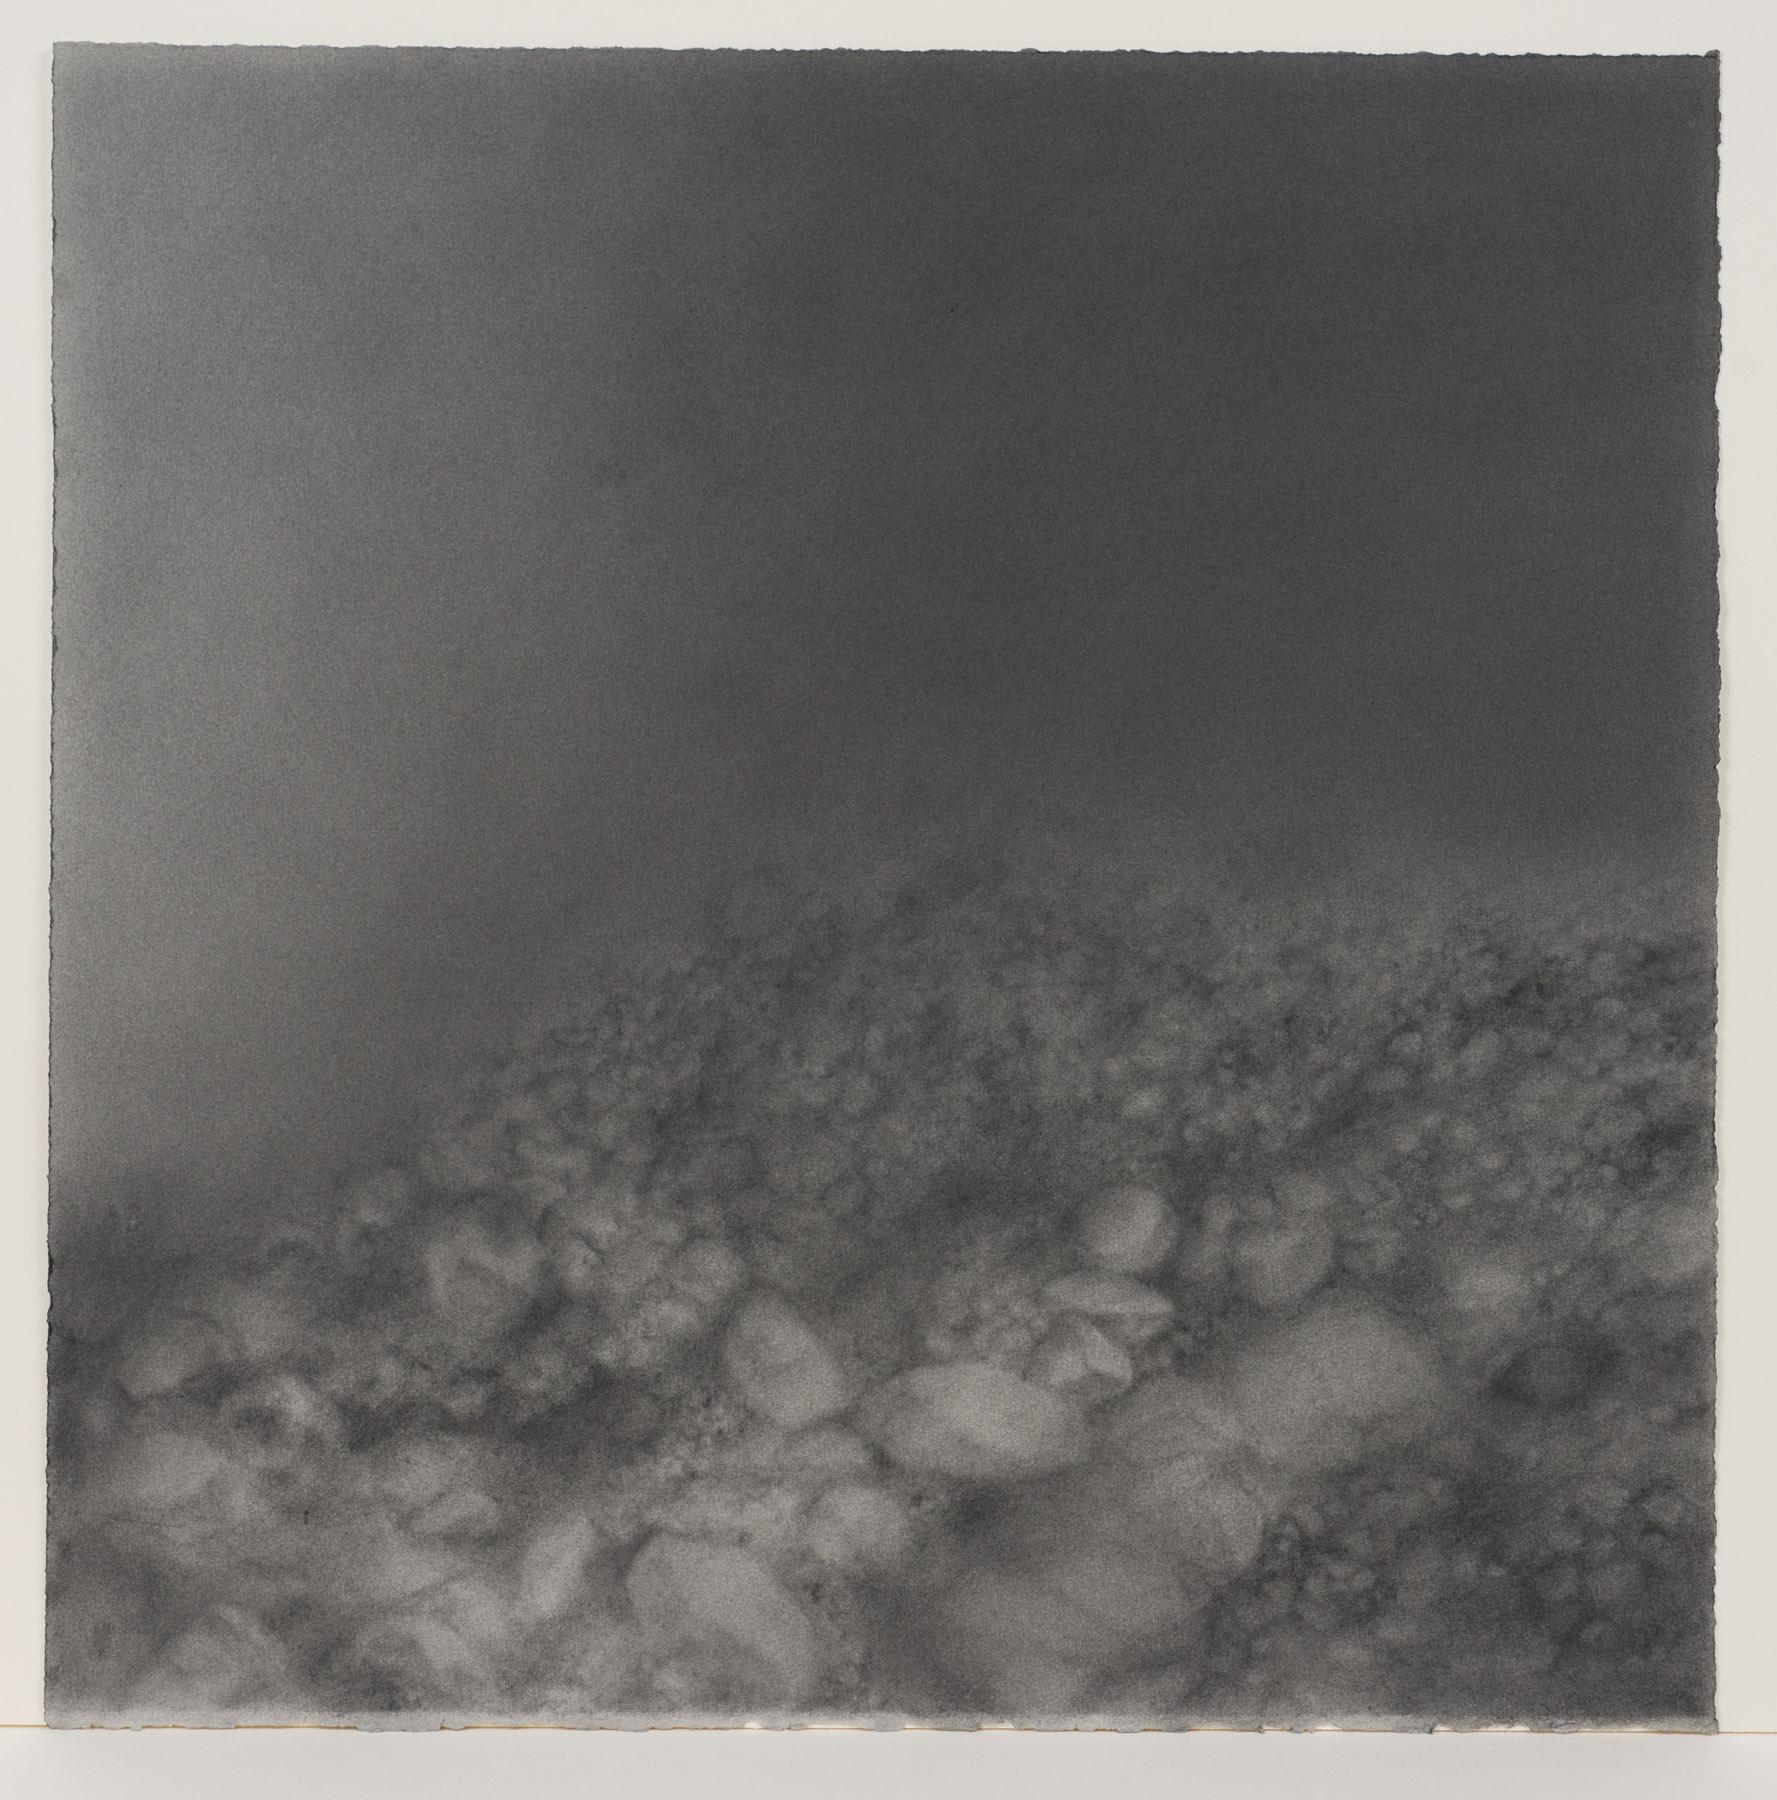 "Andréanne Godin, #04 : History of a Landscape (Variation IV), from the series Descriptions de paysages , 2015, graphite powder on Arches paper, 24"" x 24"" (61 x 61 cm)"